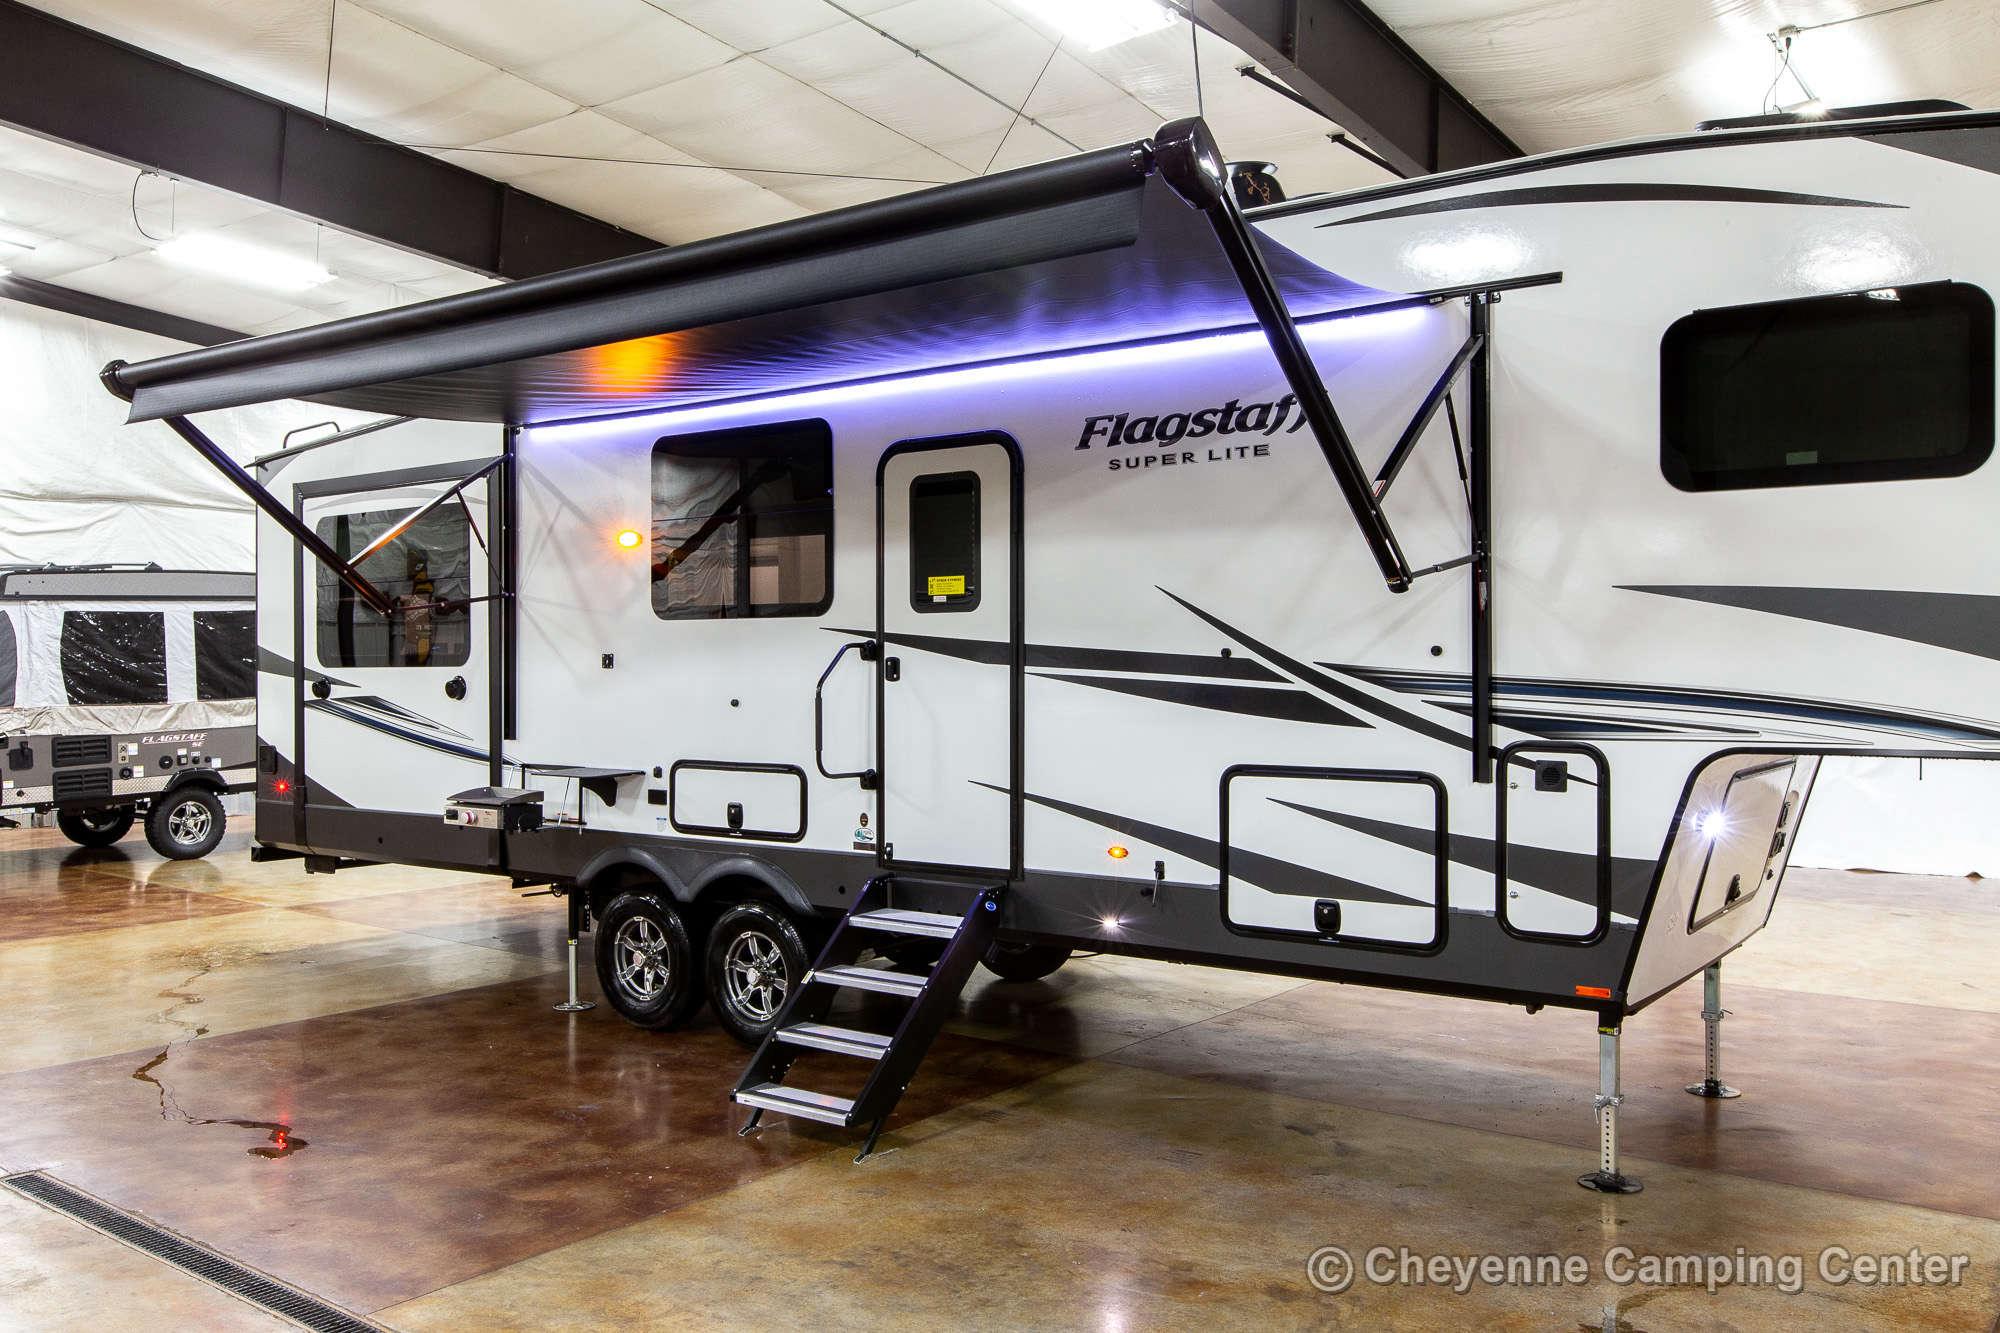 2021 Forest River Flagstaff Super Lite 529RLKS Fifth Wheel Exterior Image